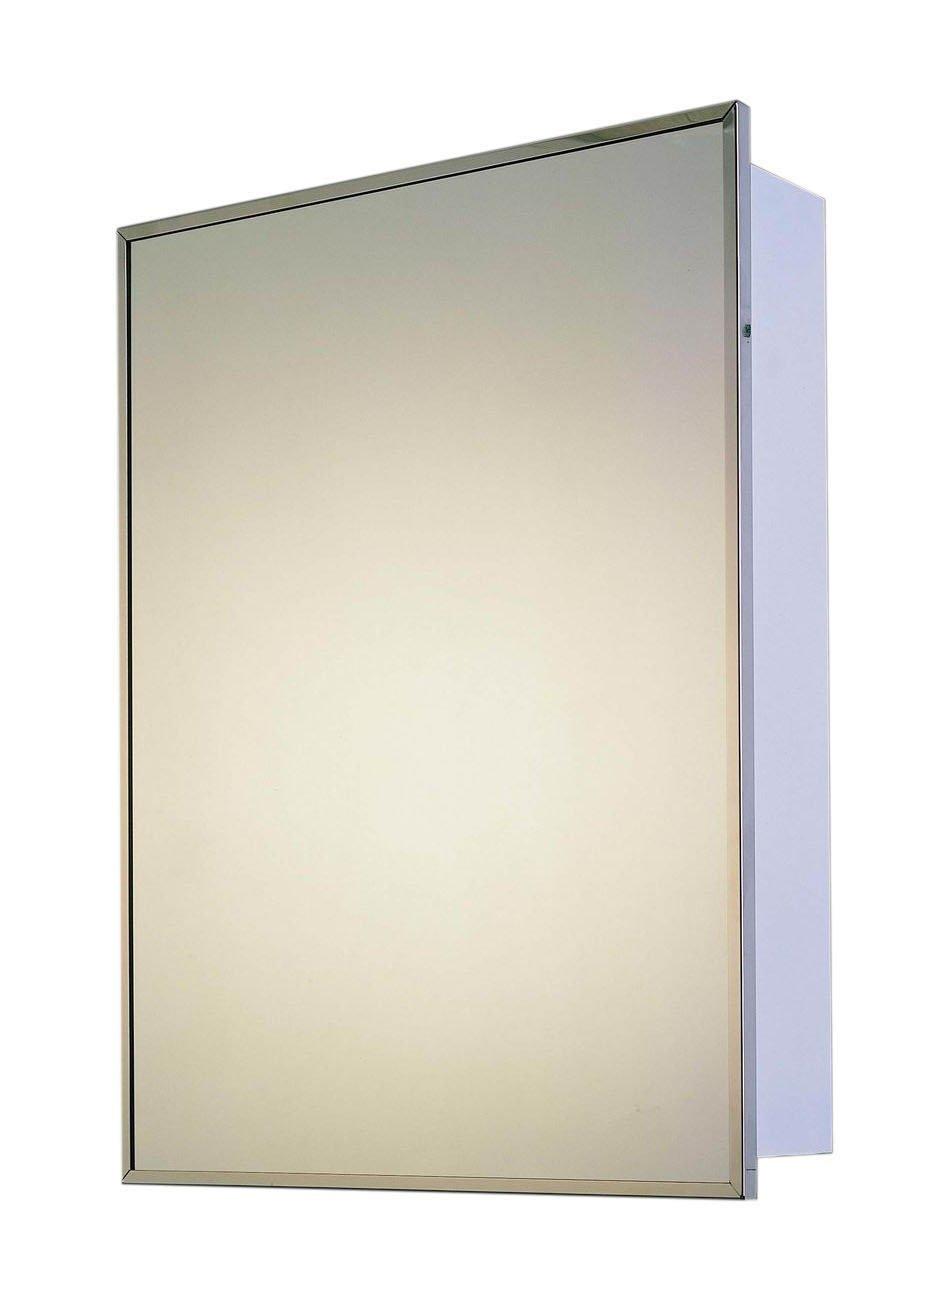 Bathroom Fixtures & Hardware -  -  - 51yzFmaP5UL -